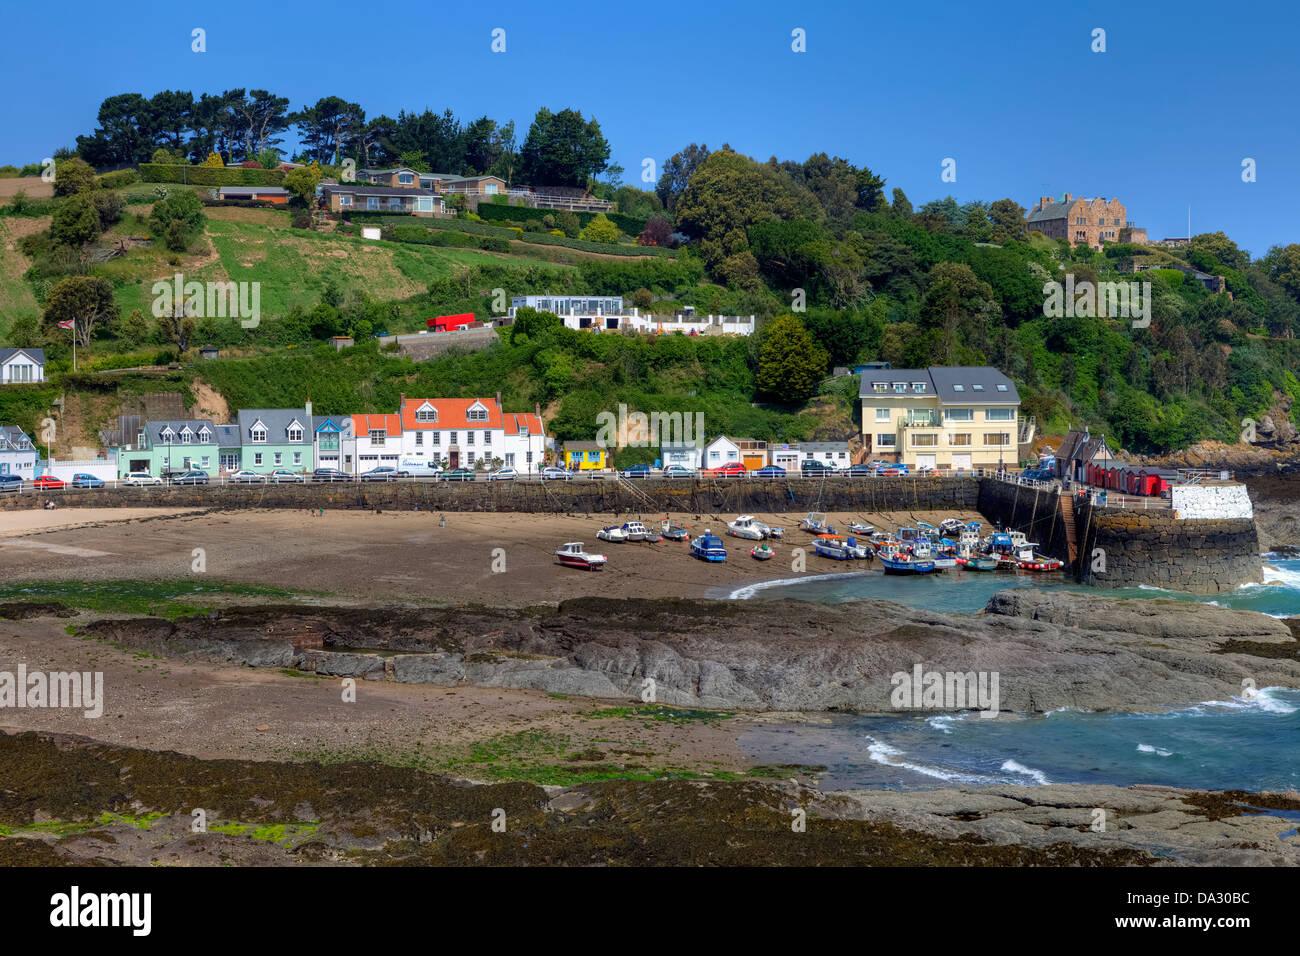 Rozel, Jersey, Channel Island, United Kingdom Photo Stock